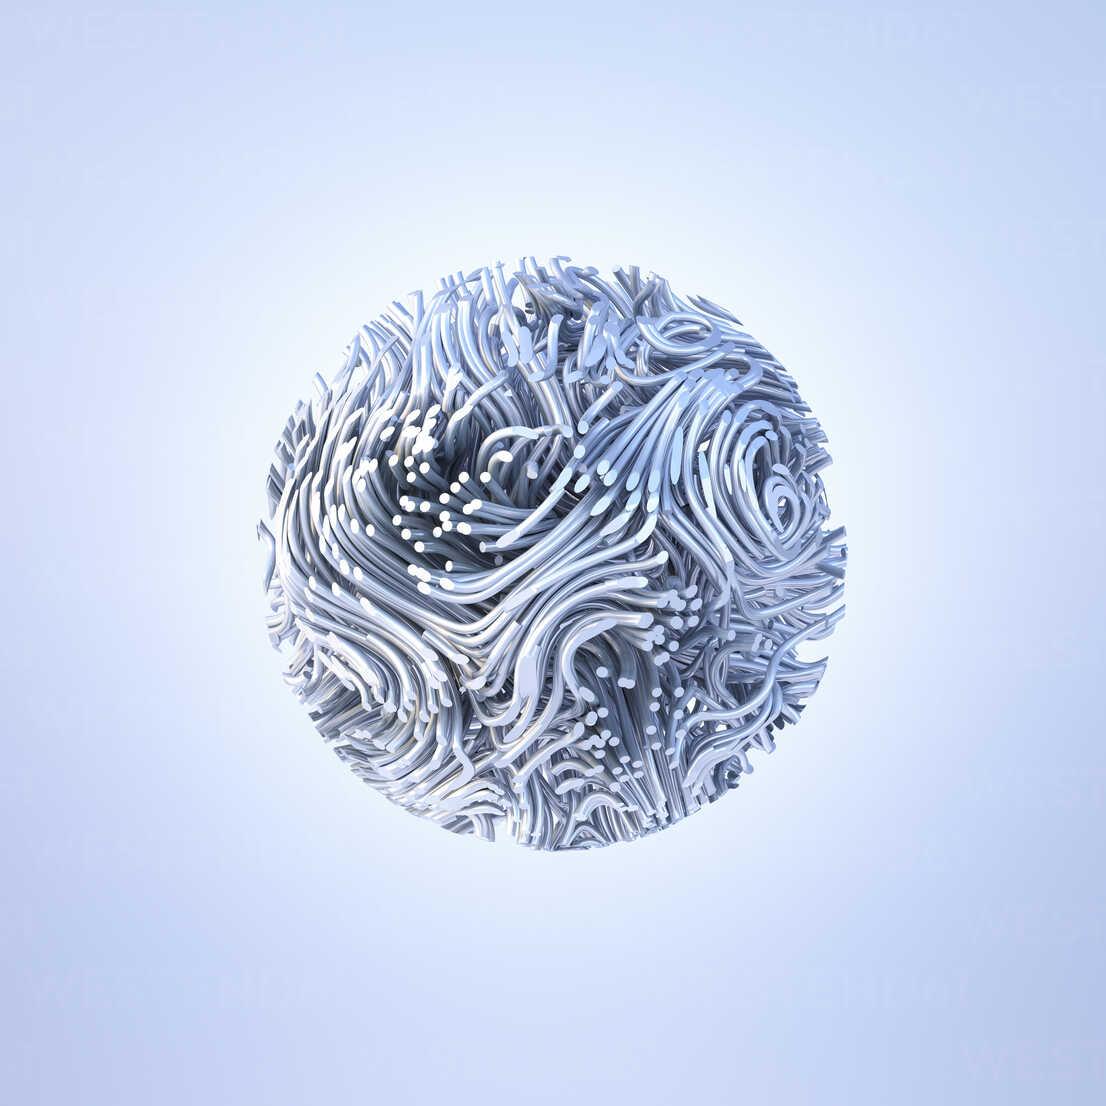 Abstract metal sphere, 3d rendering - AHUF00429 - Anna Huber/Westend61